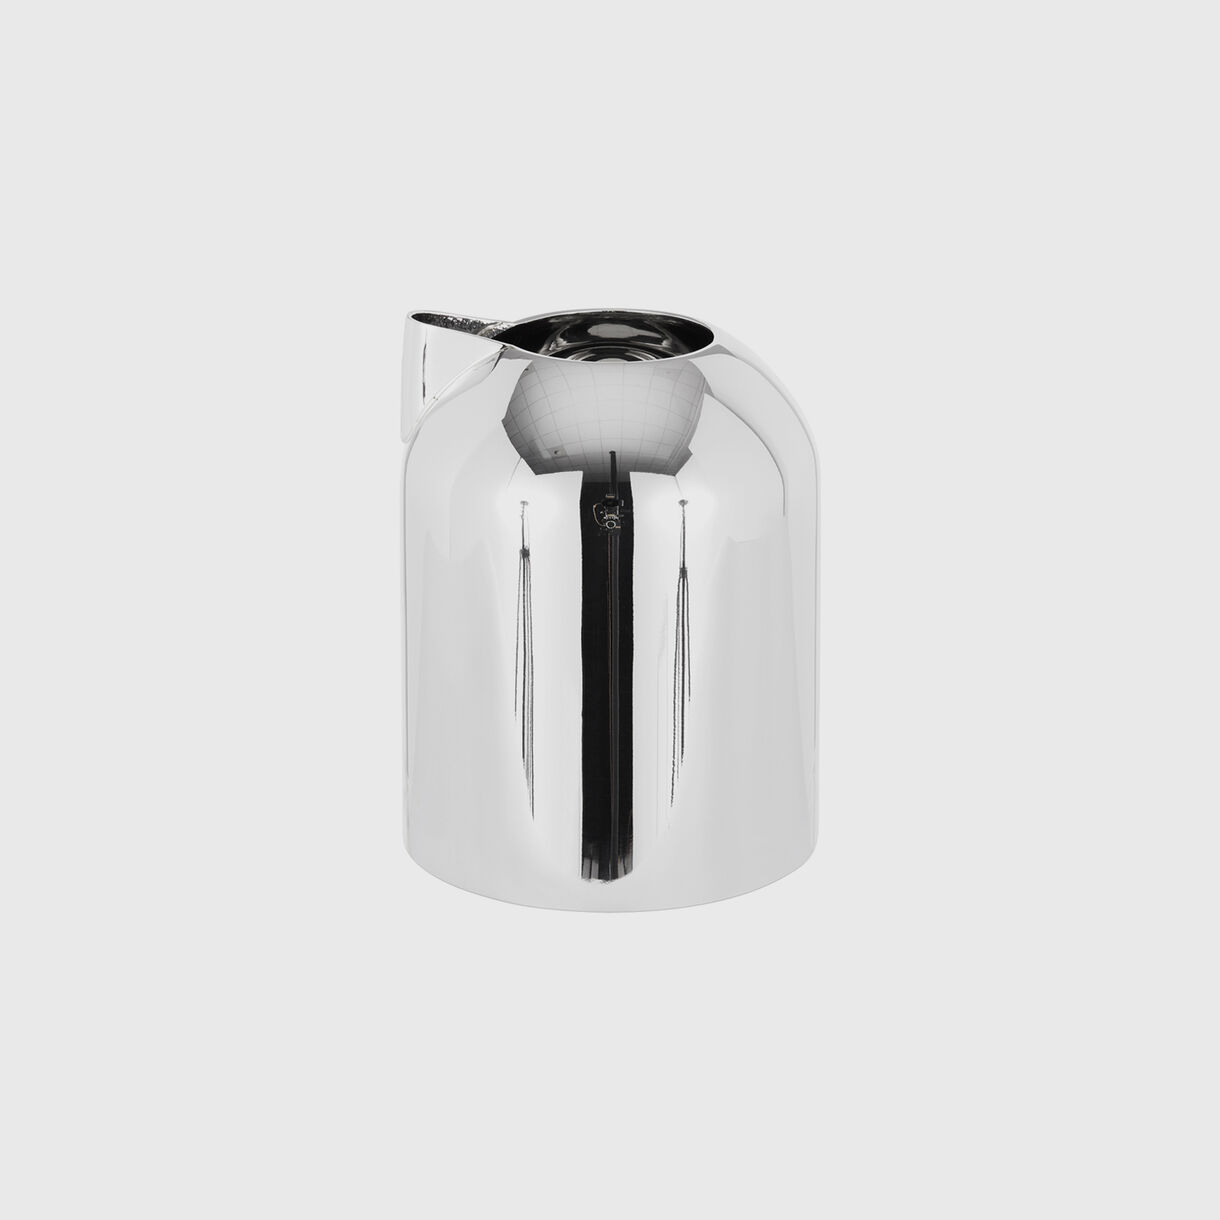 Form Milk Jug, Stainless Steel